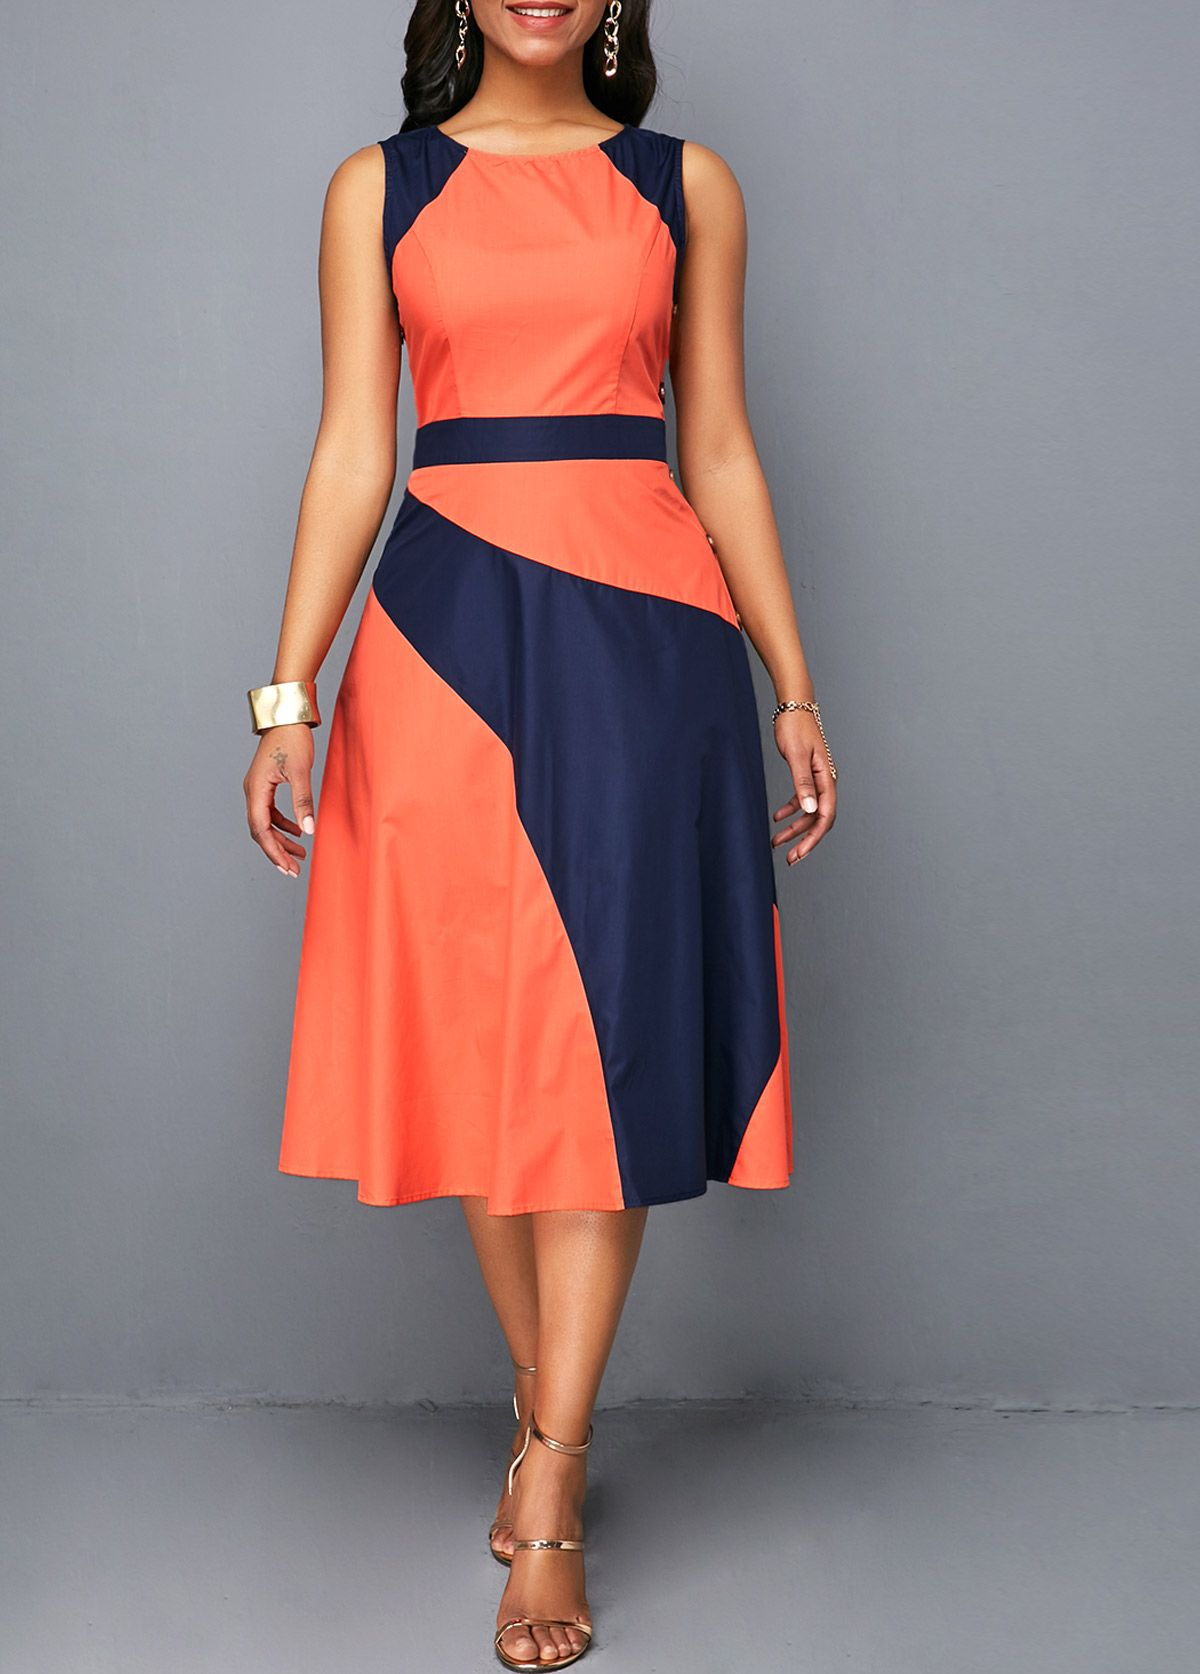 Sleeveless High Waist Button Detail Dress Rosewe Com Usd 29 96 Moda Evangelica Vestidos Longos Vestidos Estilosos Moda Evangelica Vestidos [ 1674 x 1200 Pixel ]